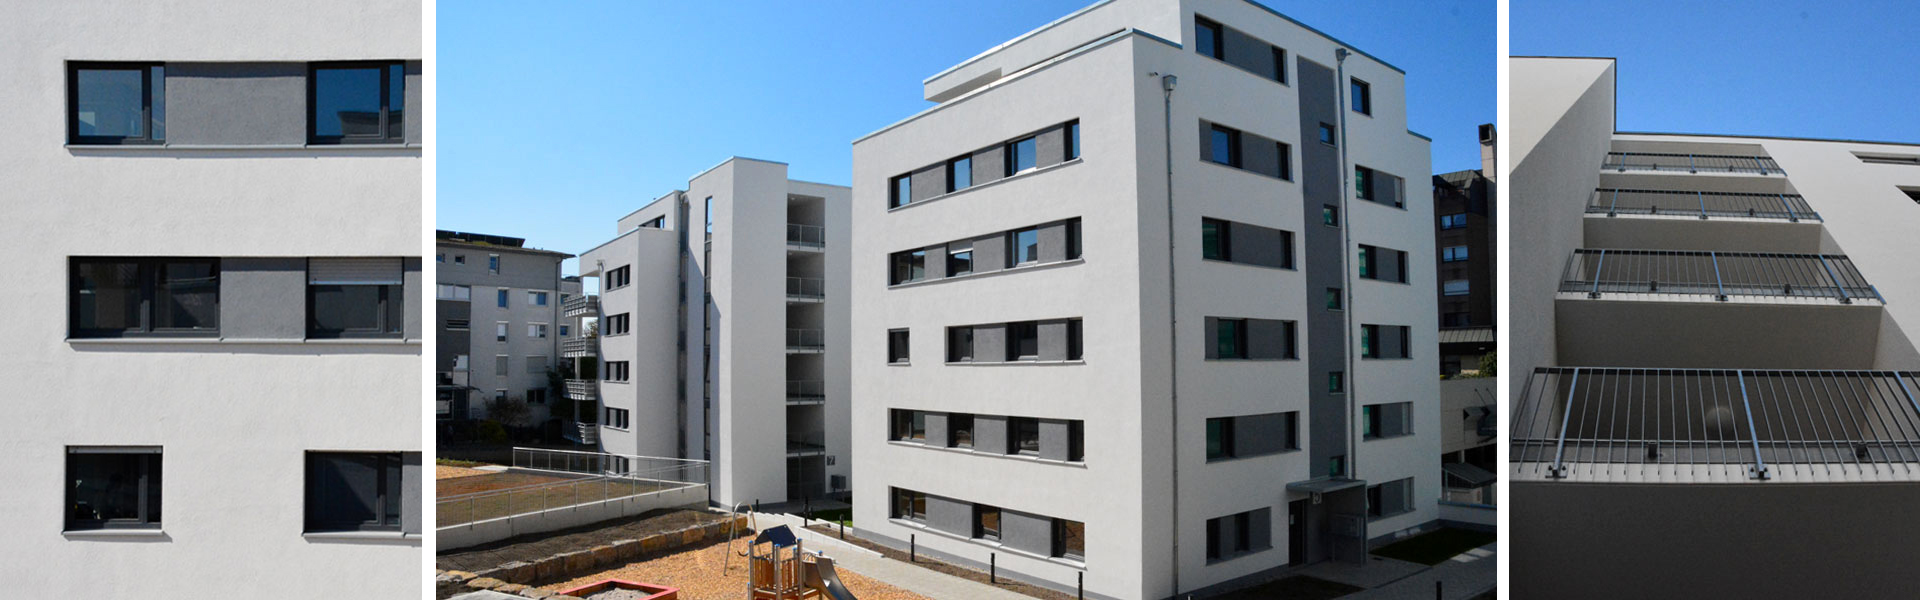 gb-architekten-slider-bahnhofstrasse-1